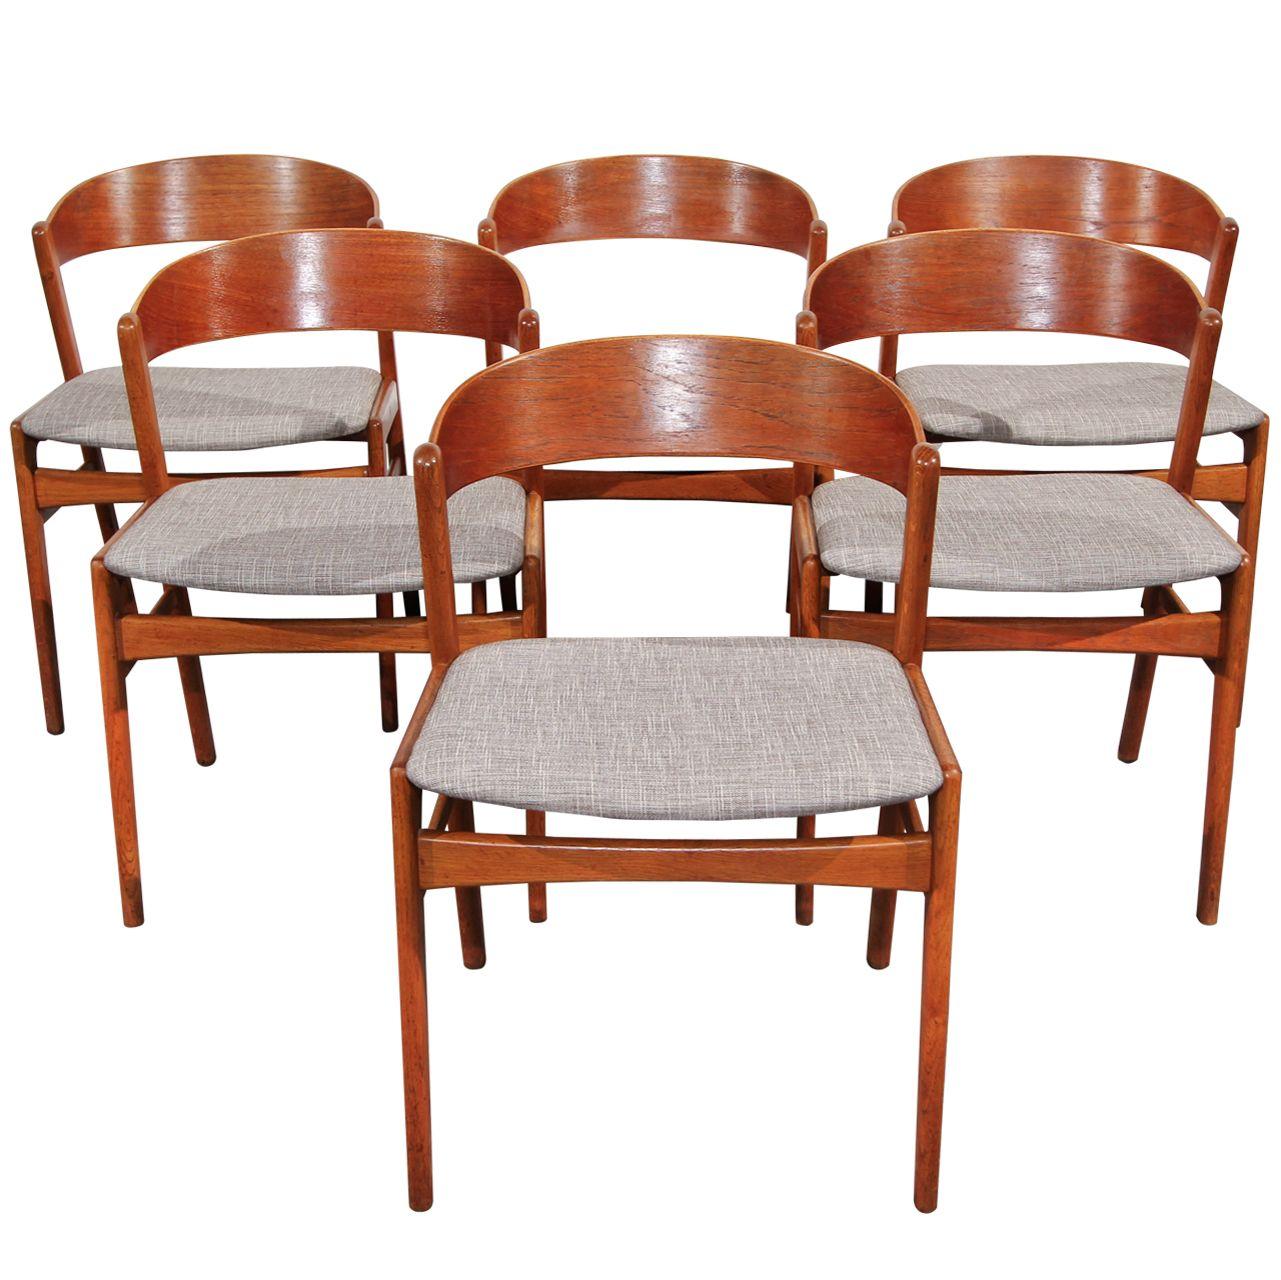 Fine Ribbon Back Teak Dining Chairs By Dux Teak Dining Chairs Short Links Chair Design For Home Short Linksinfo